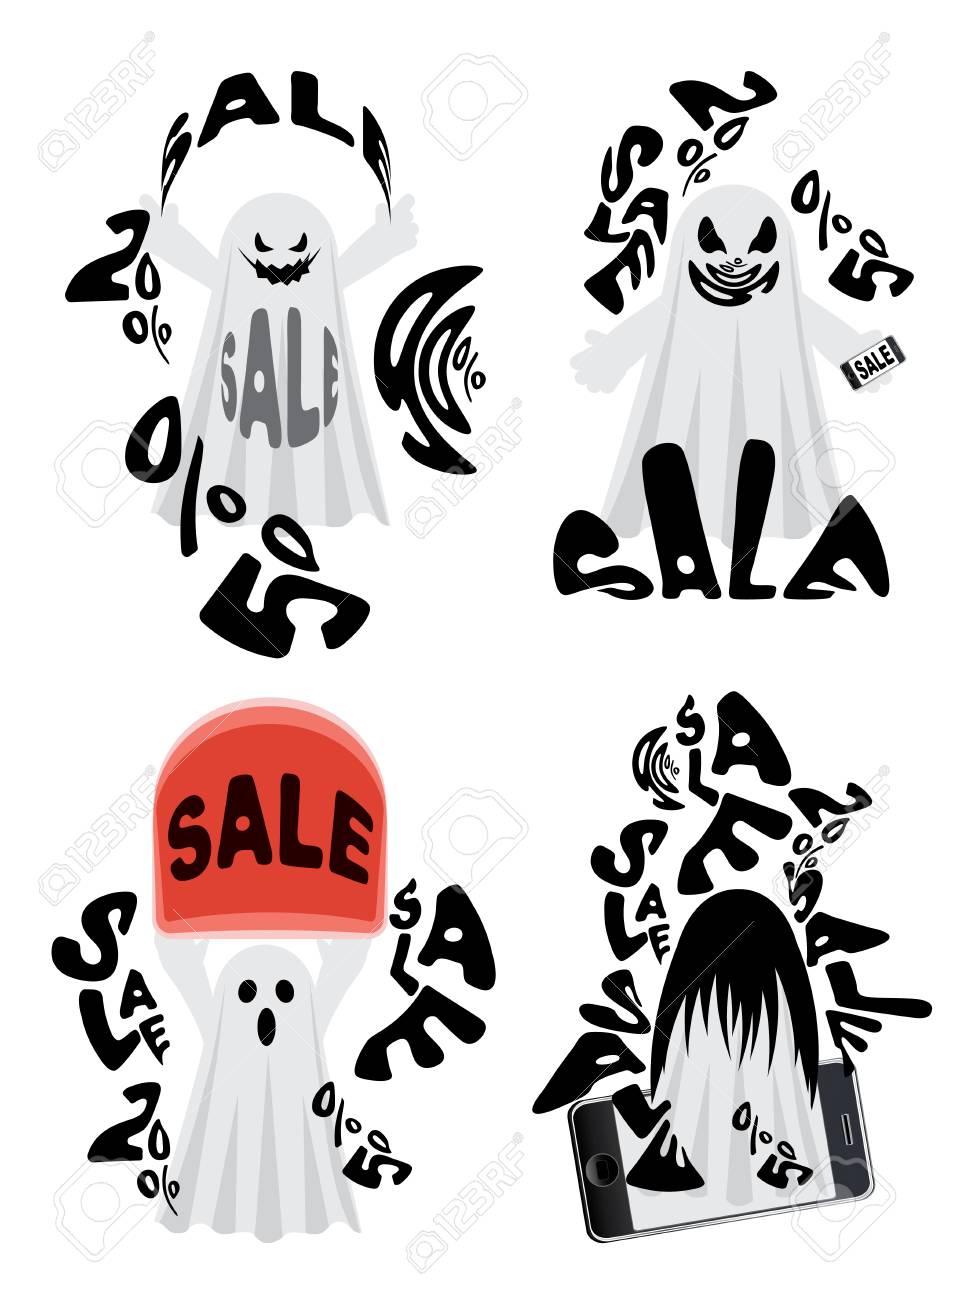 Excepcional Diseños De Caras De Calabaza 2 Viñeta - Ideas Para ...